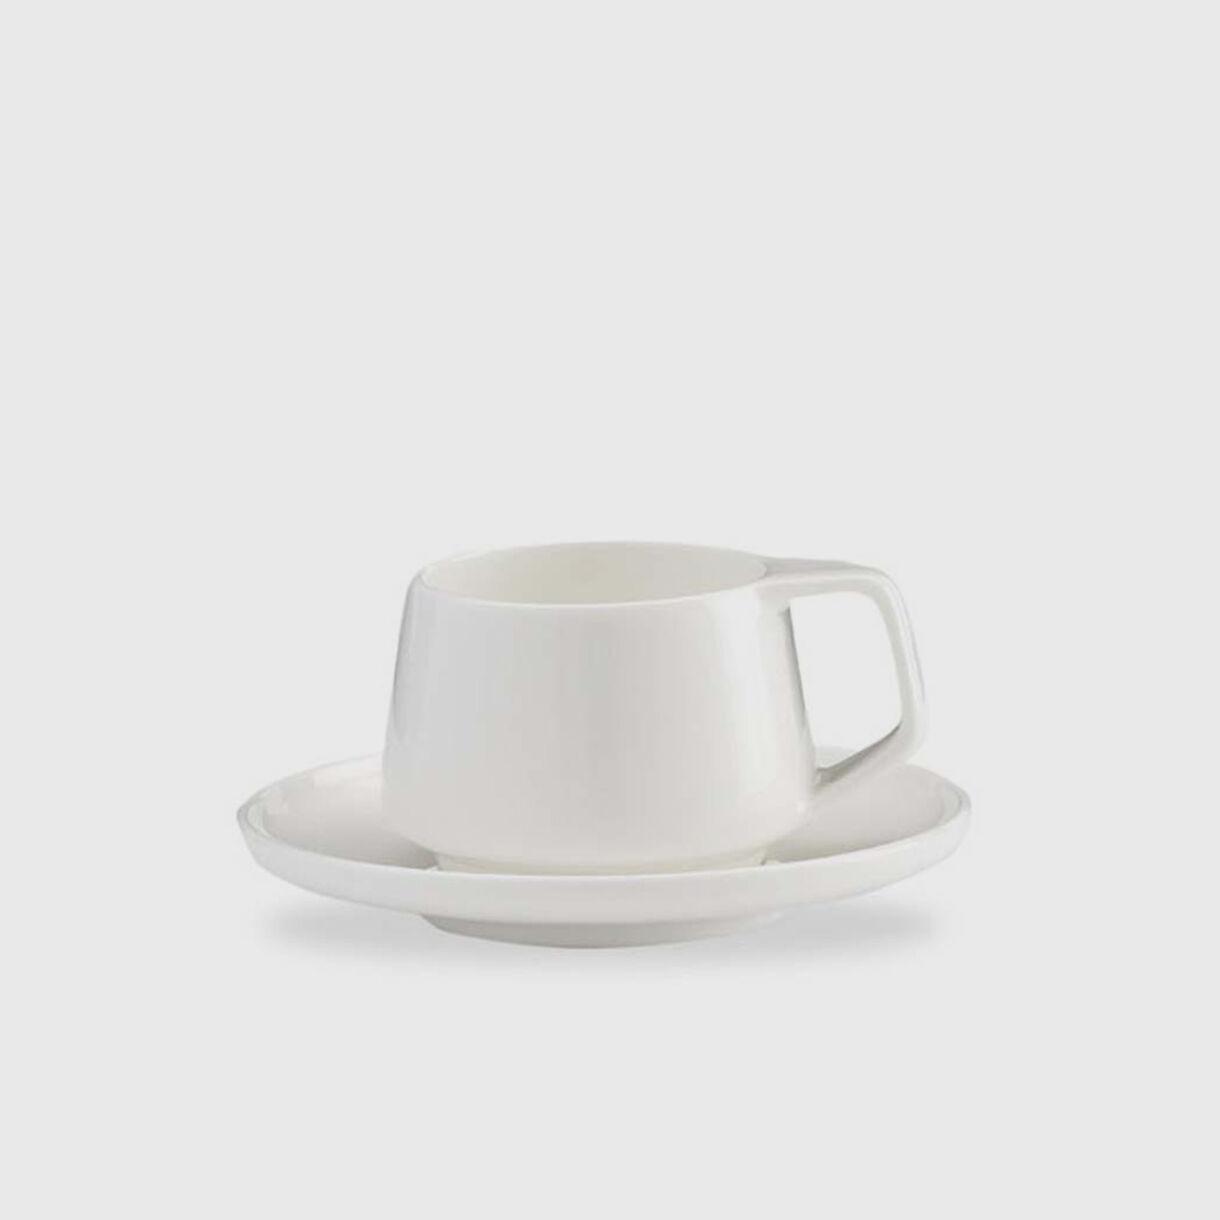 Mark Newson by Noritake Espresso Cup & Saucer